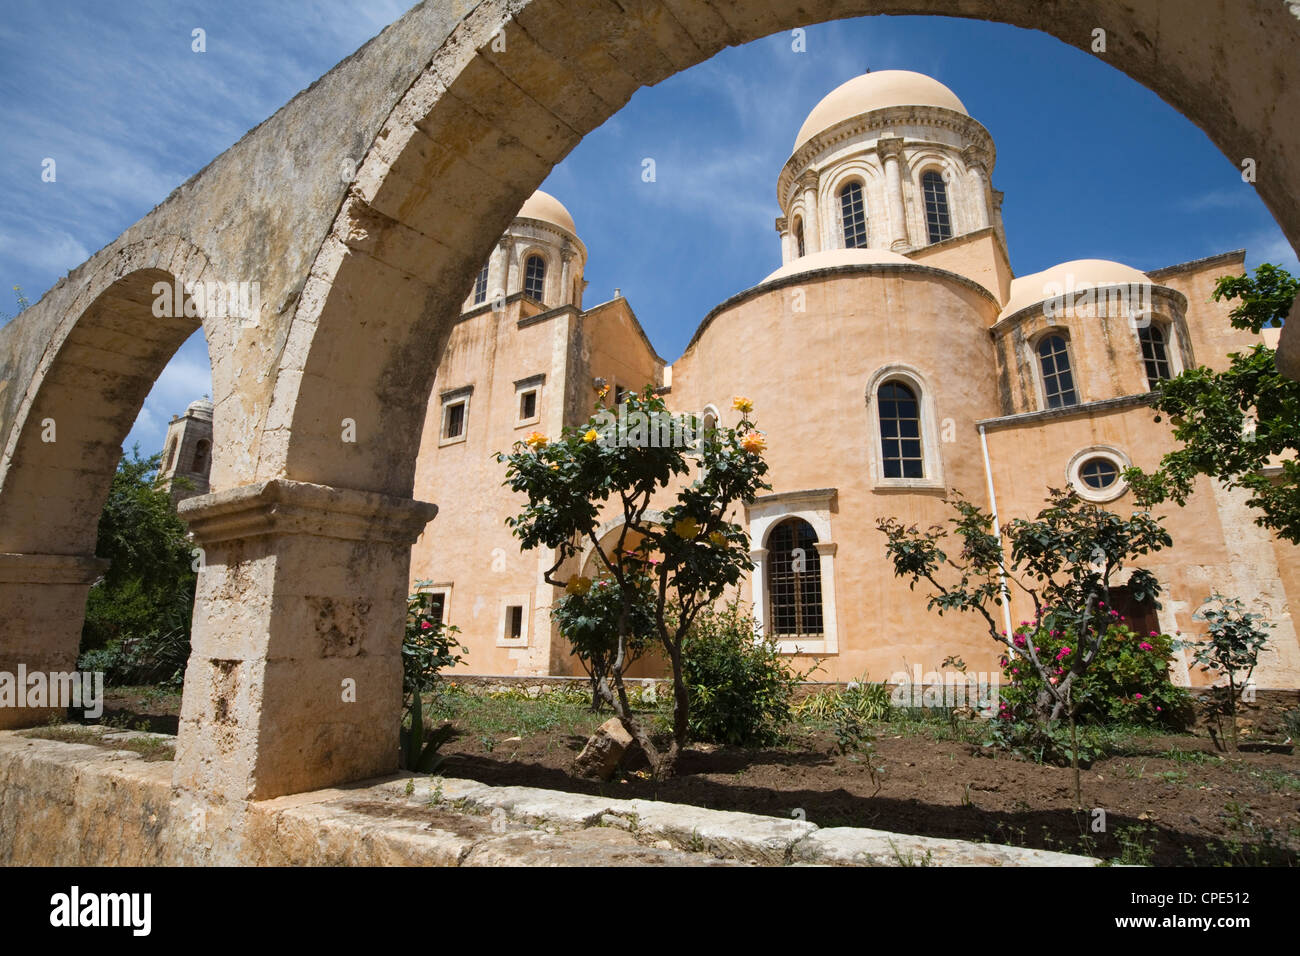 Church inside the monastery complex, Chania region, Crete, Greek Islands, Greece - Stock Image